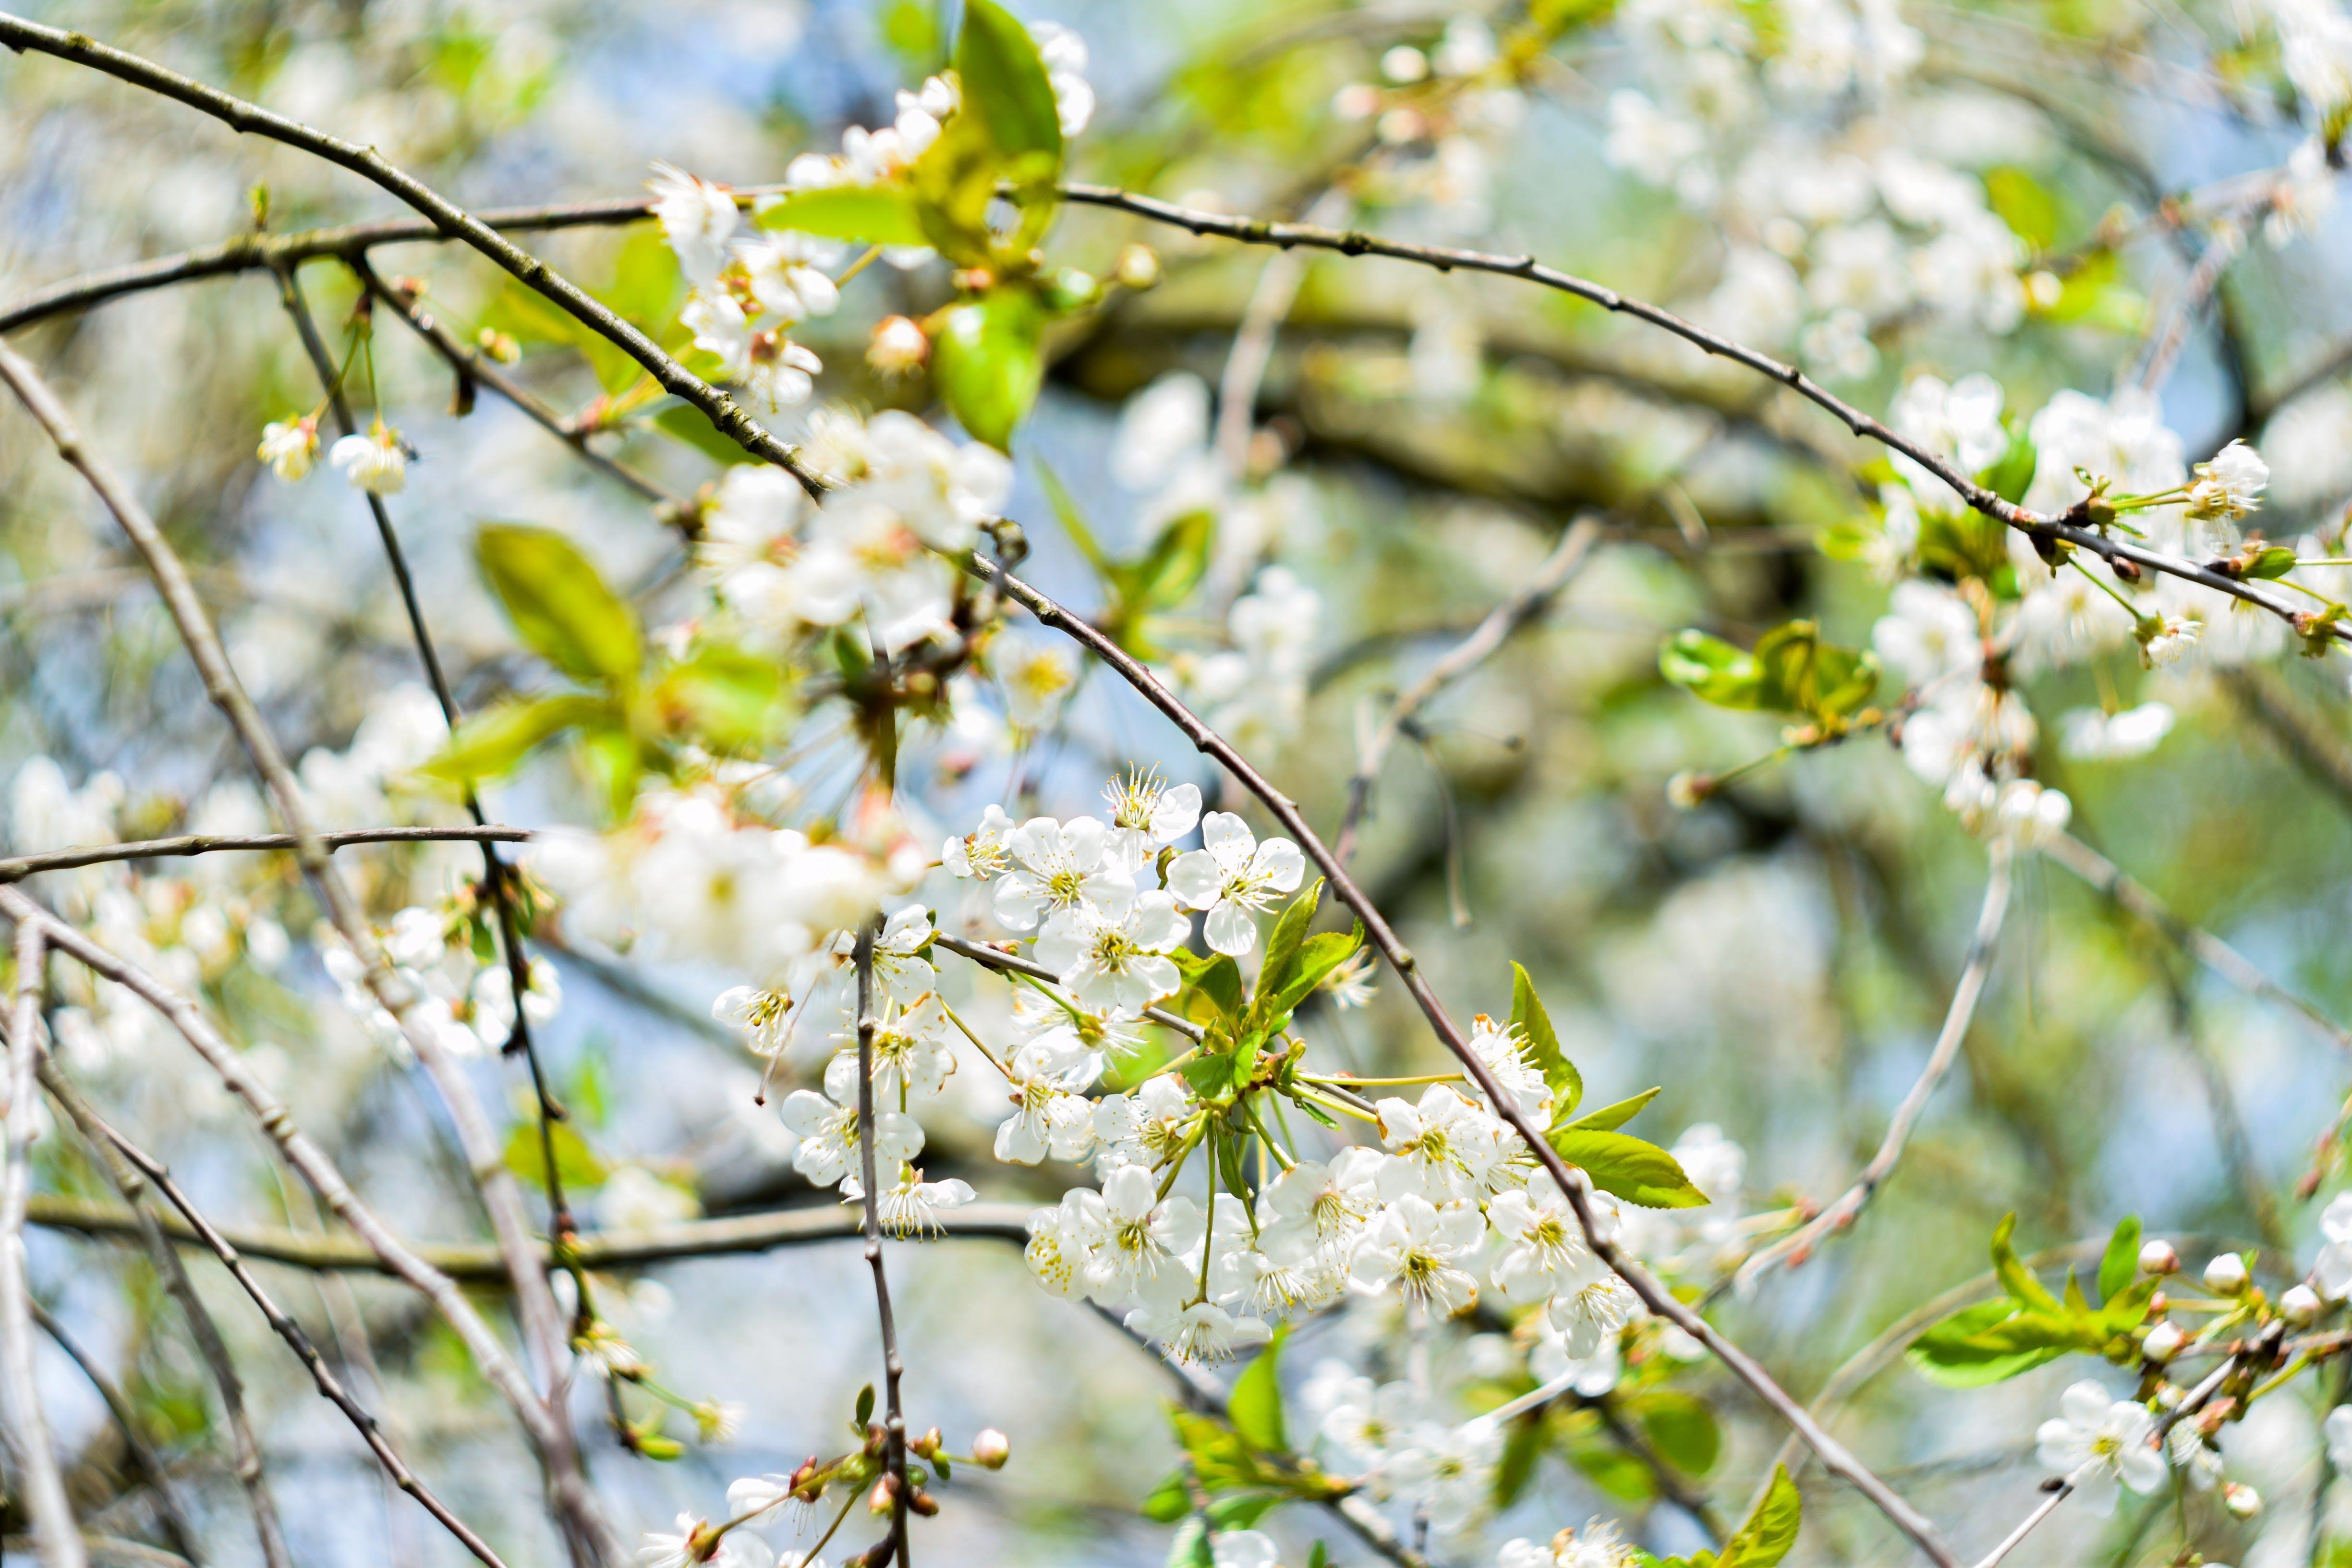 White Petal Flowers